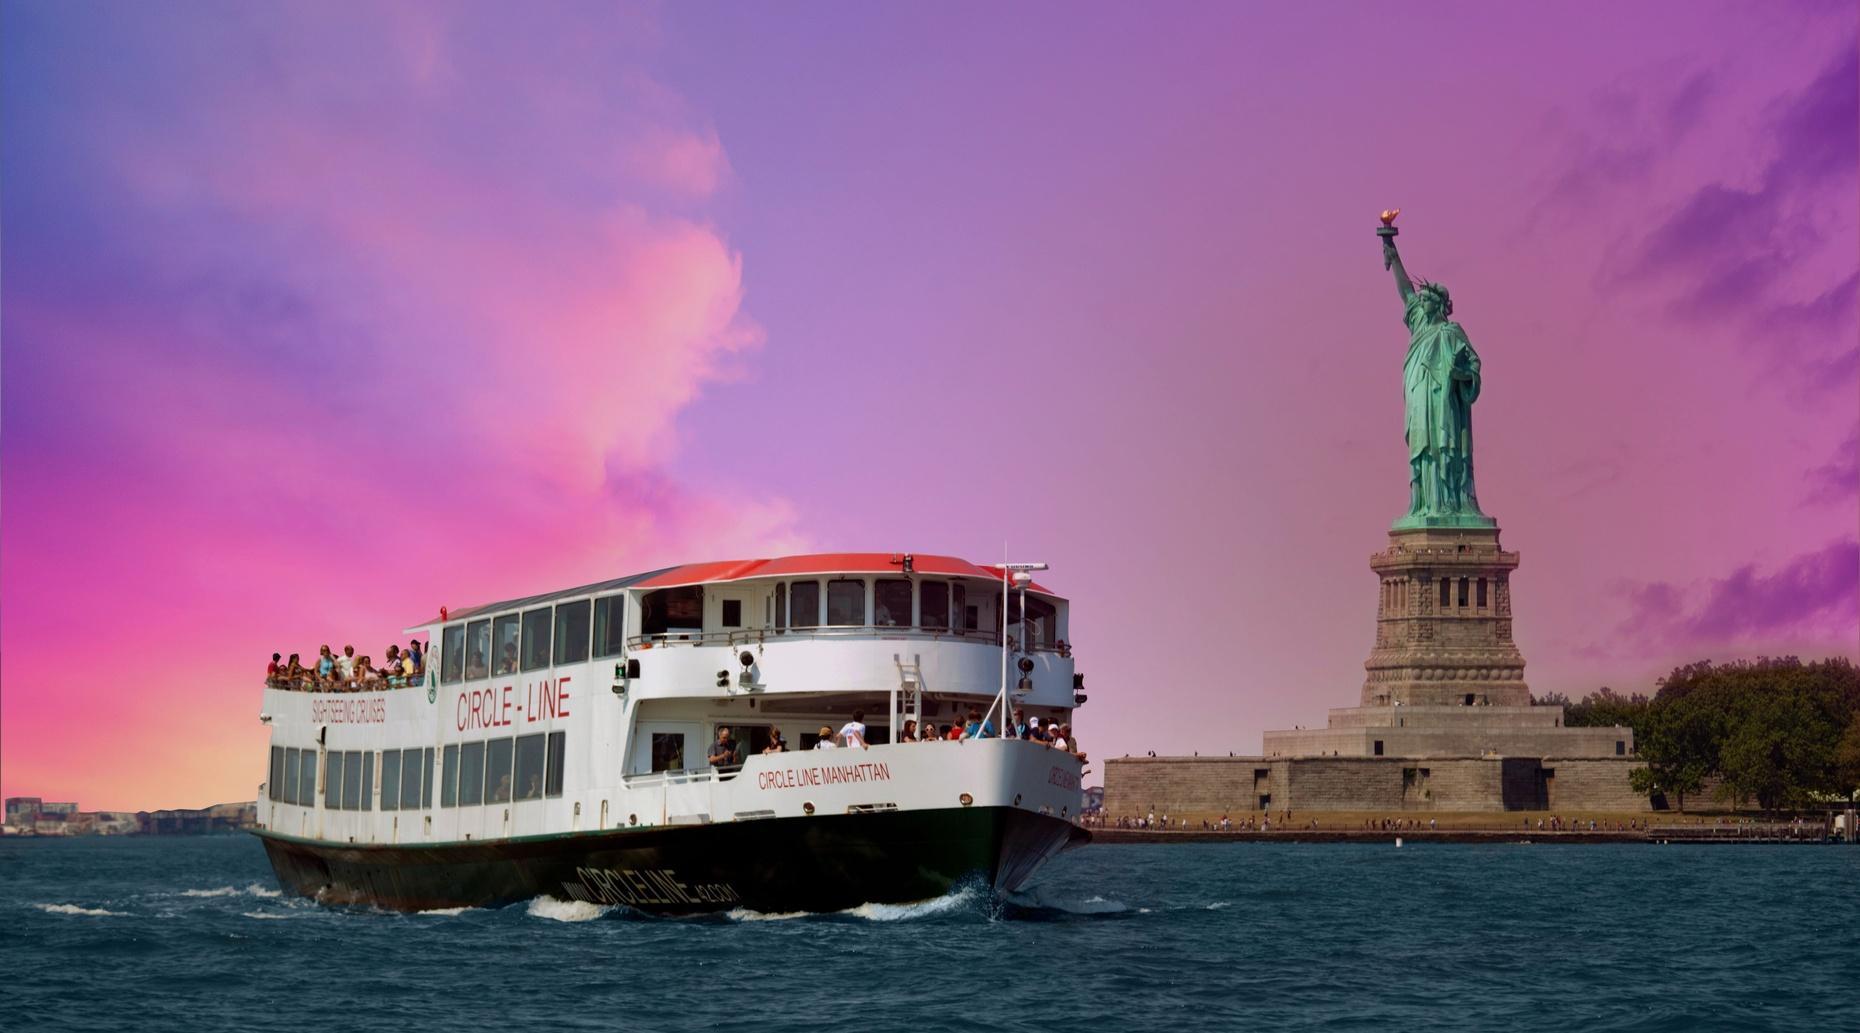 New York City Harbor Lights Night Cruise